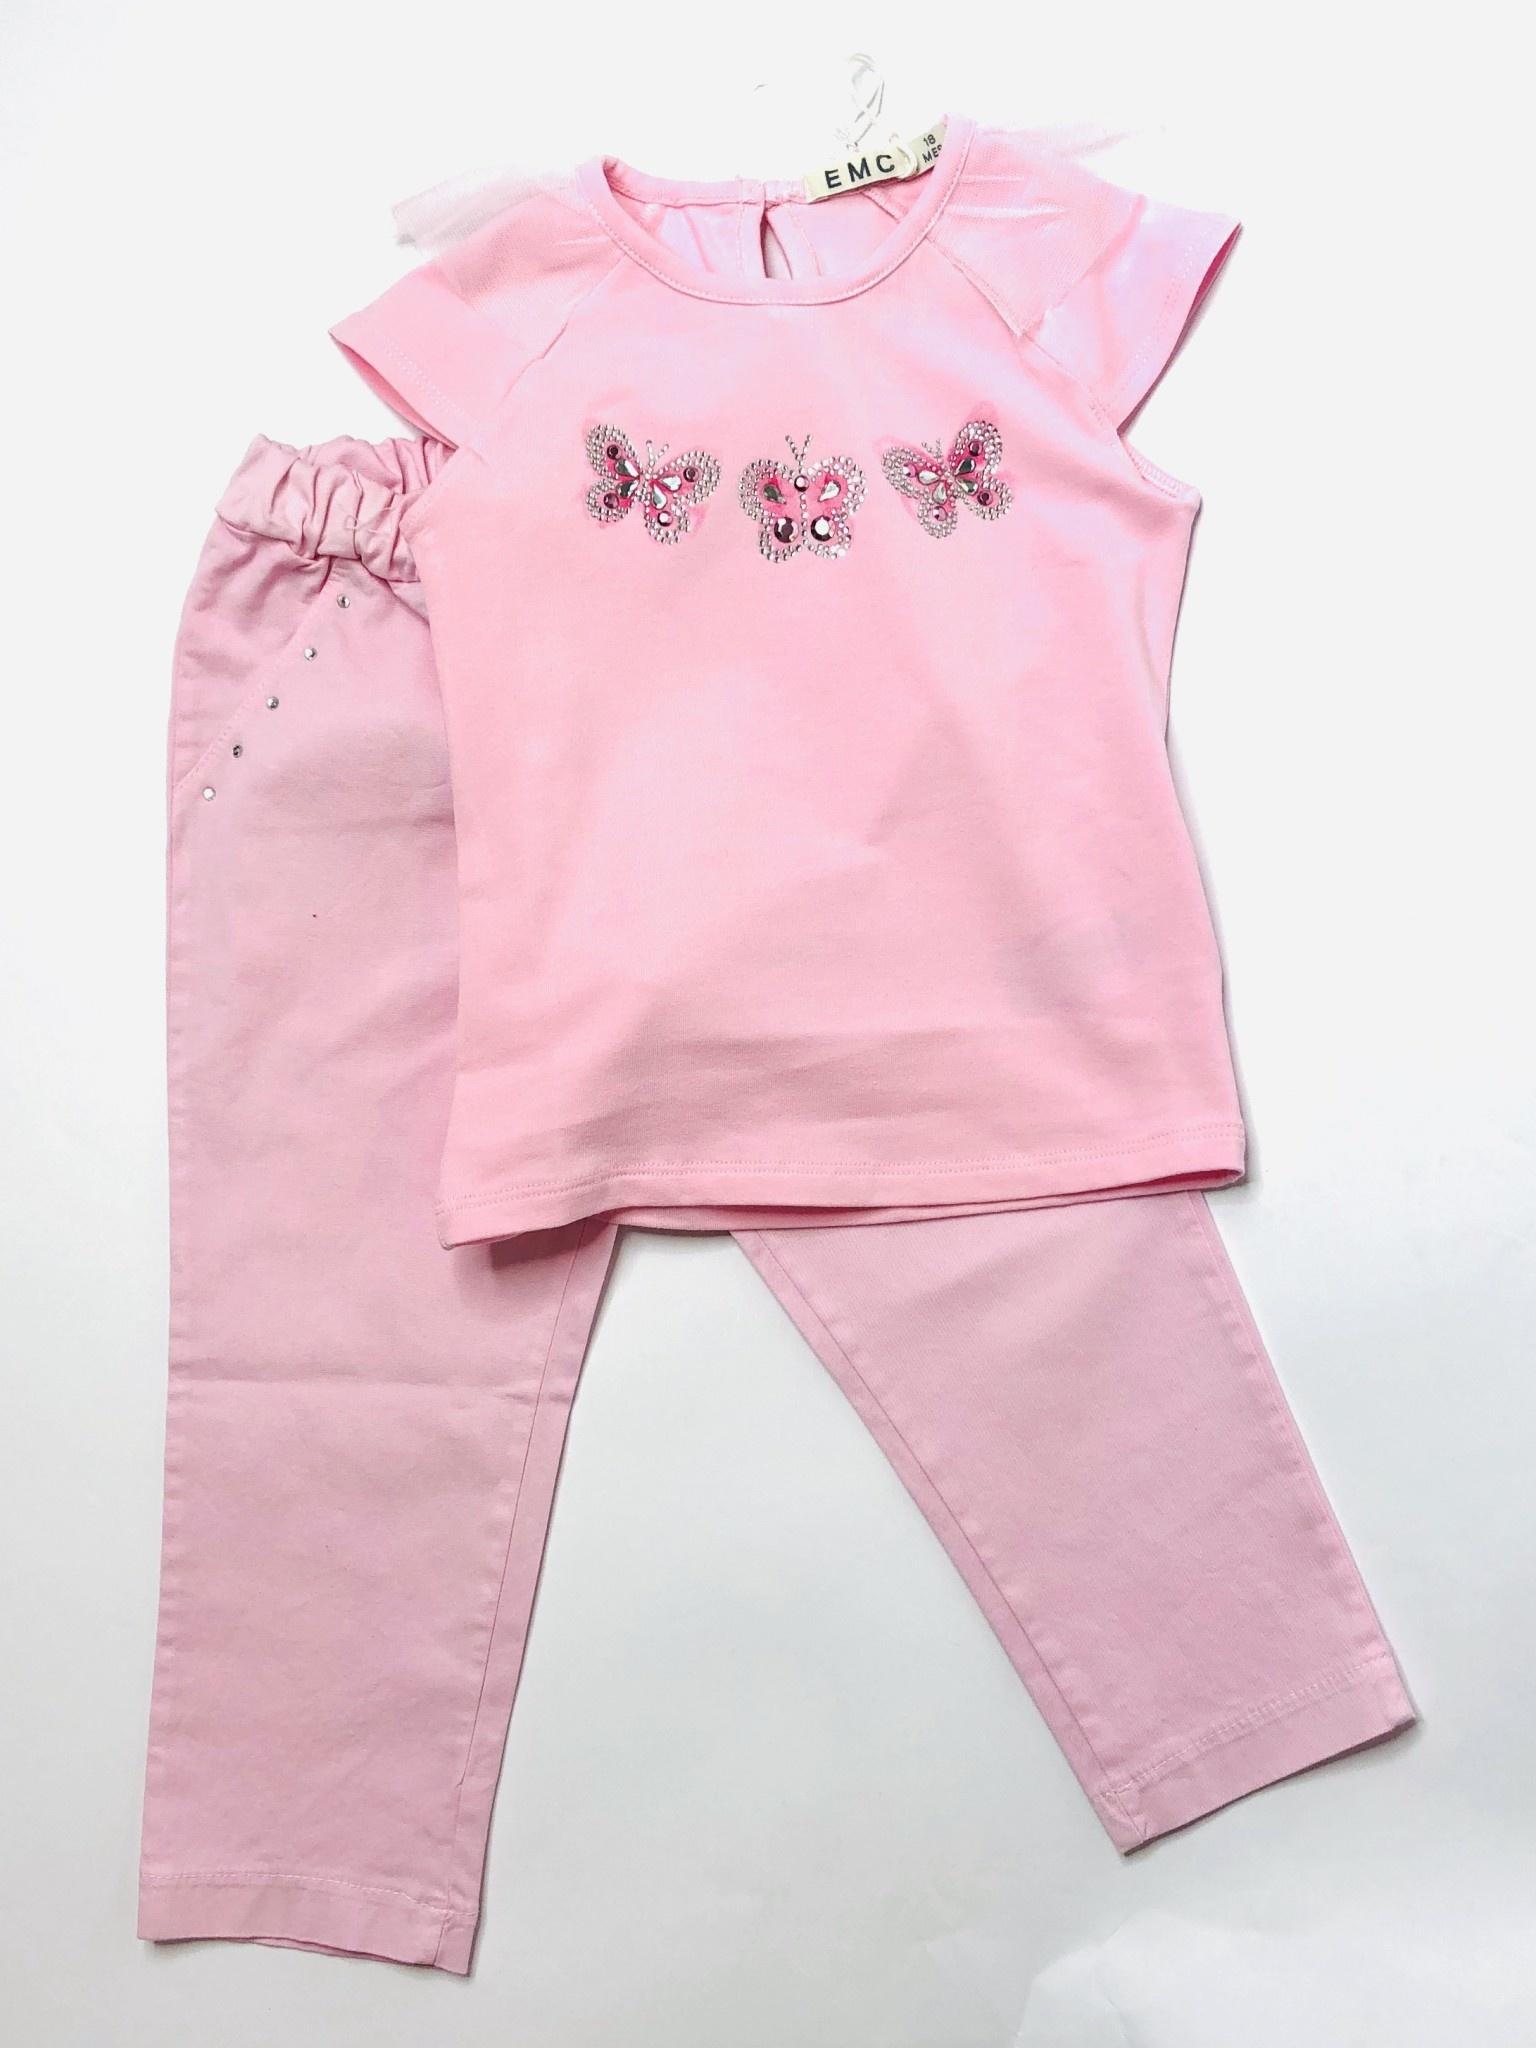 EMC EMC Pink Butterfly Top & Legging Set